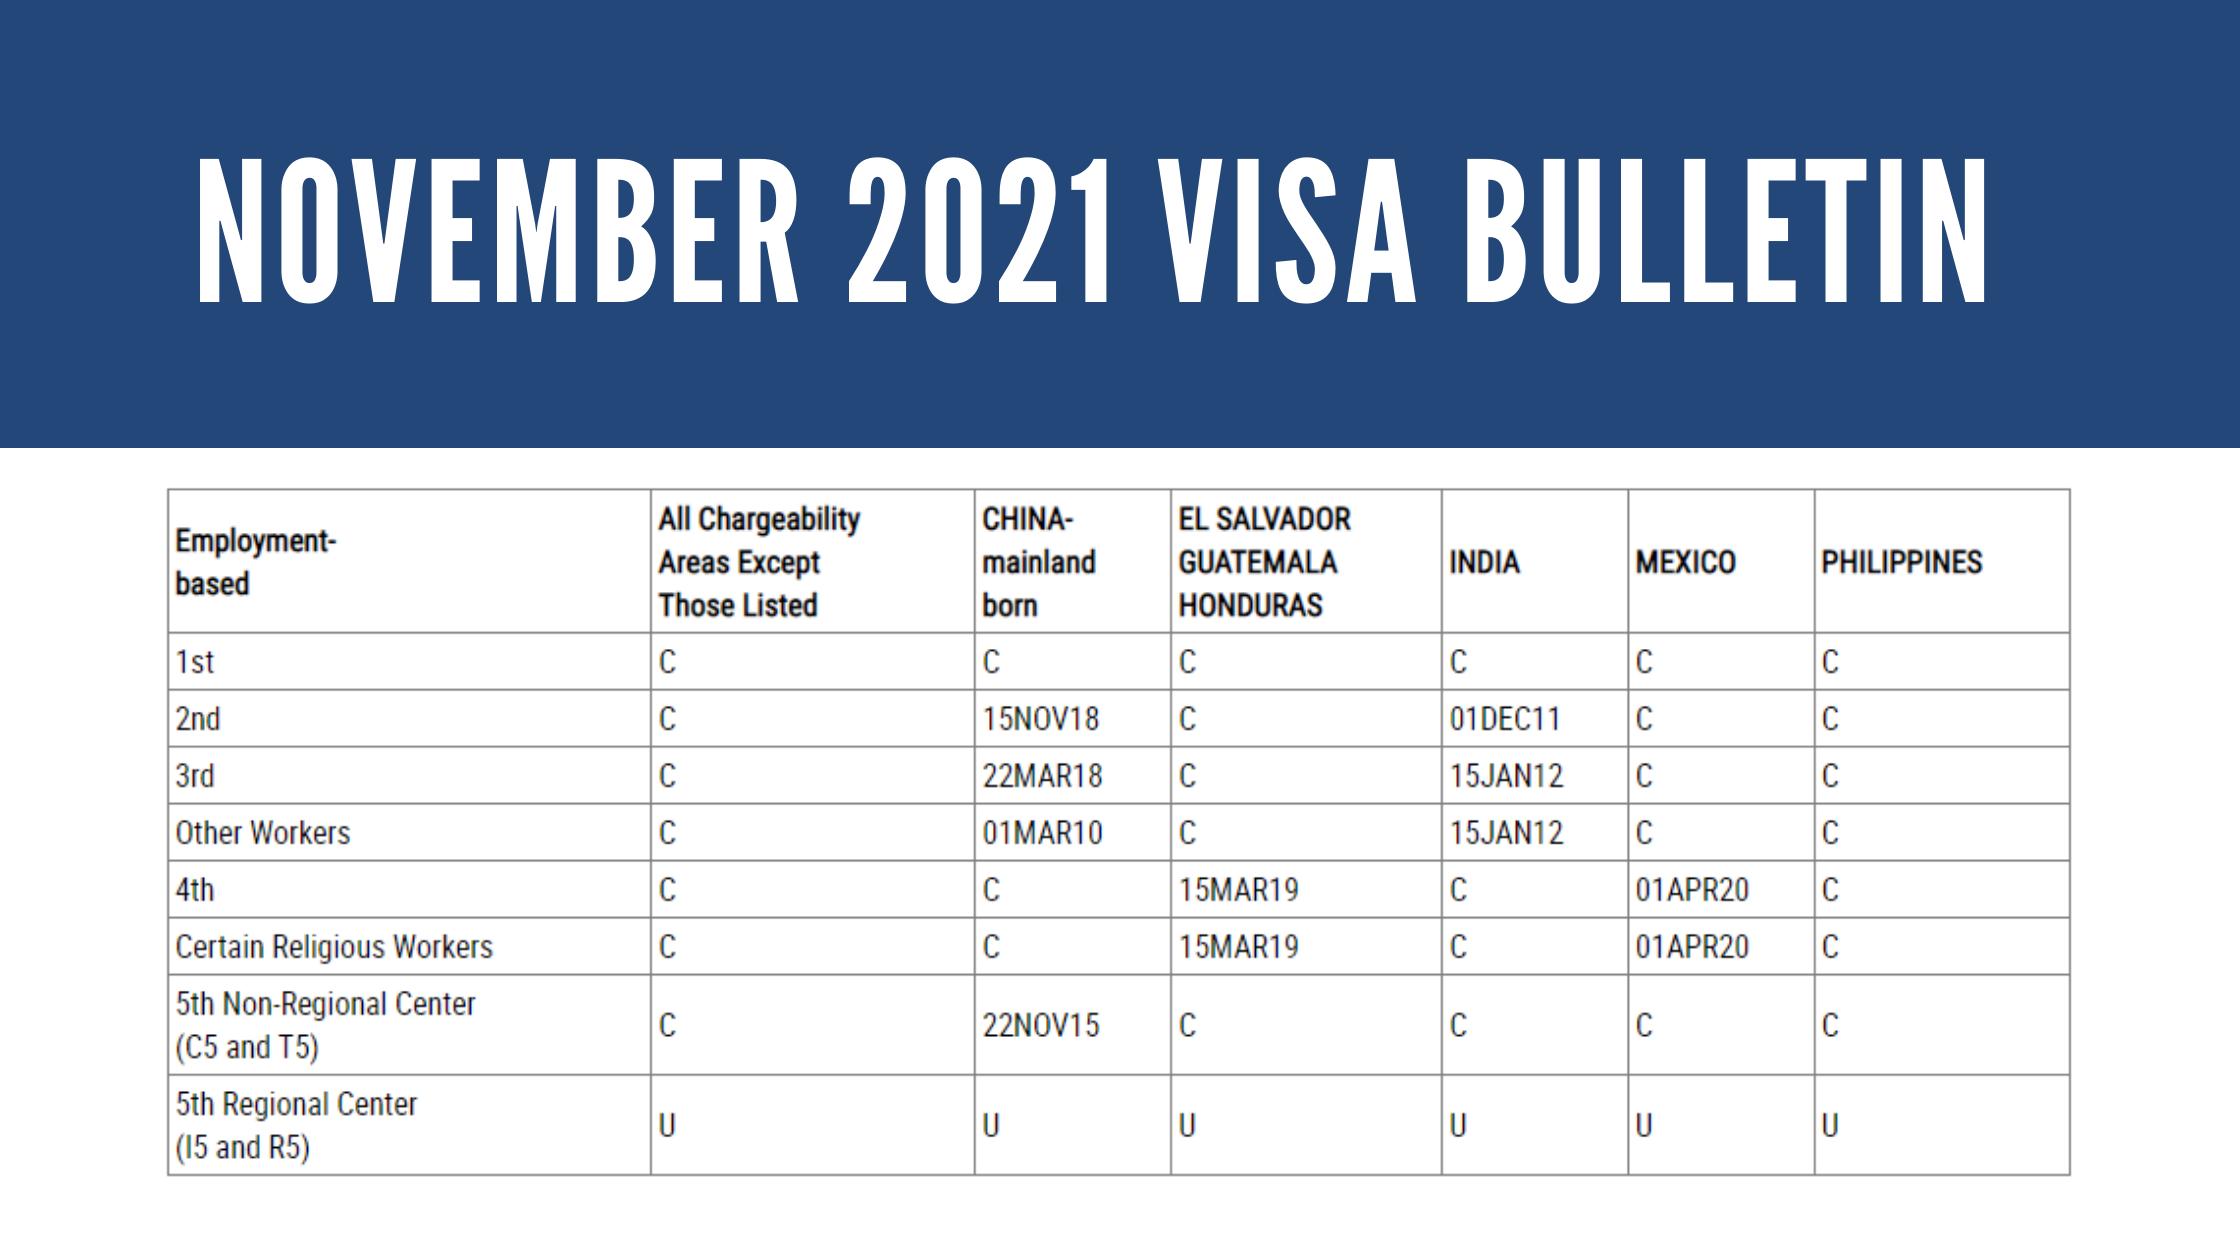 NOVEMBER 2021 VISA BULLETIN: UNCHANGED FOR EB-5 CATEGORY